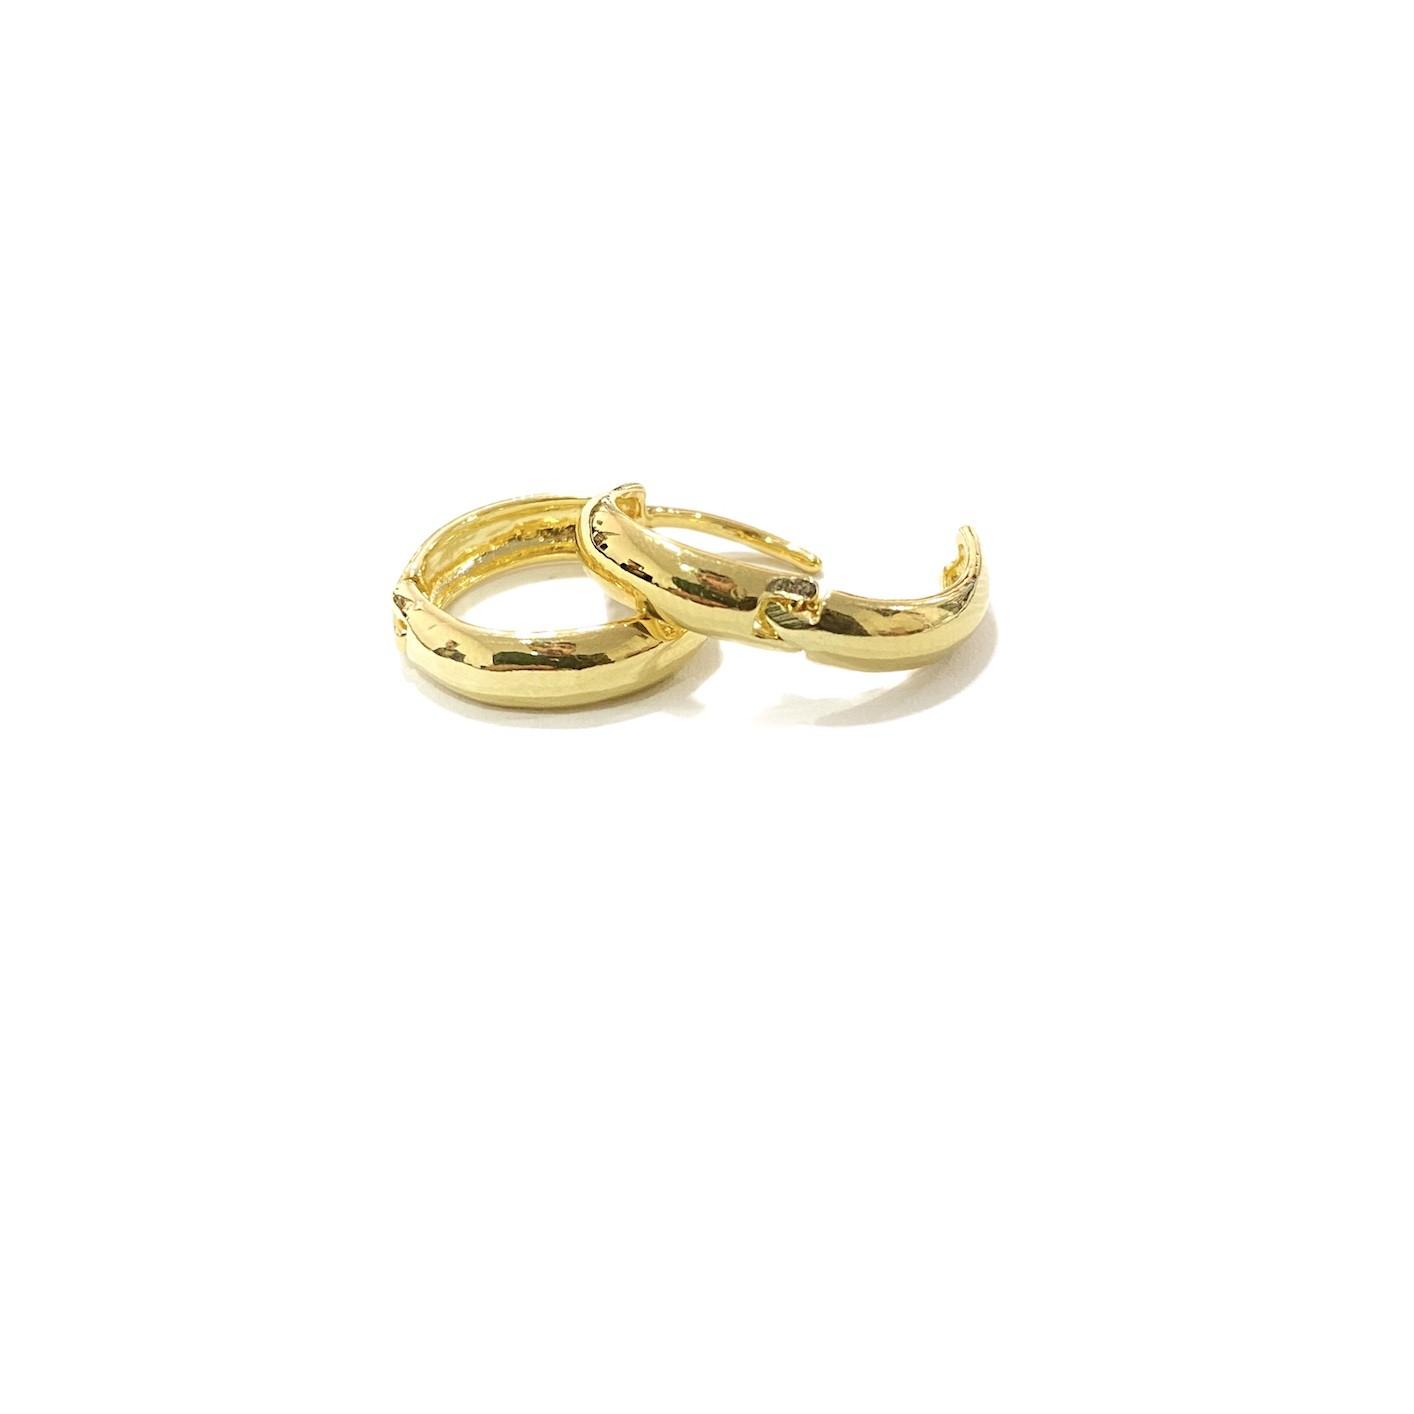 Brinco Argola Anatômica M (Banho Ouro 24k)